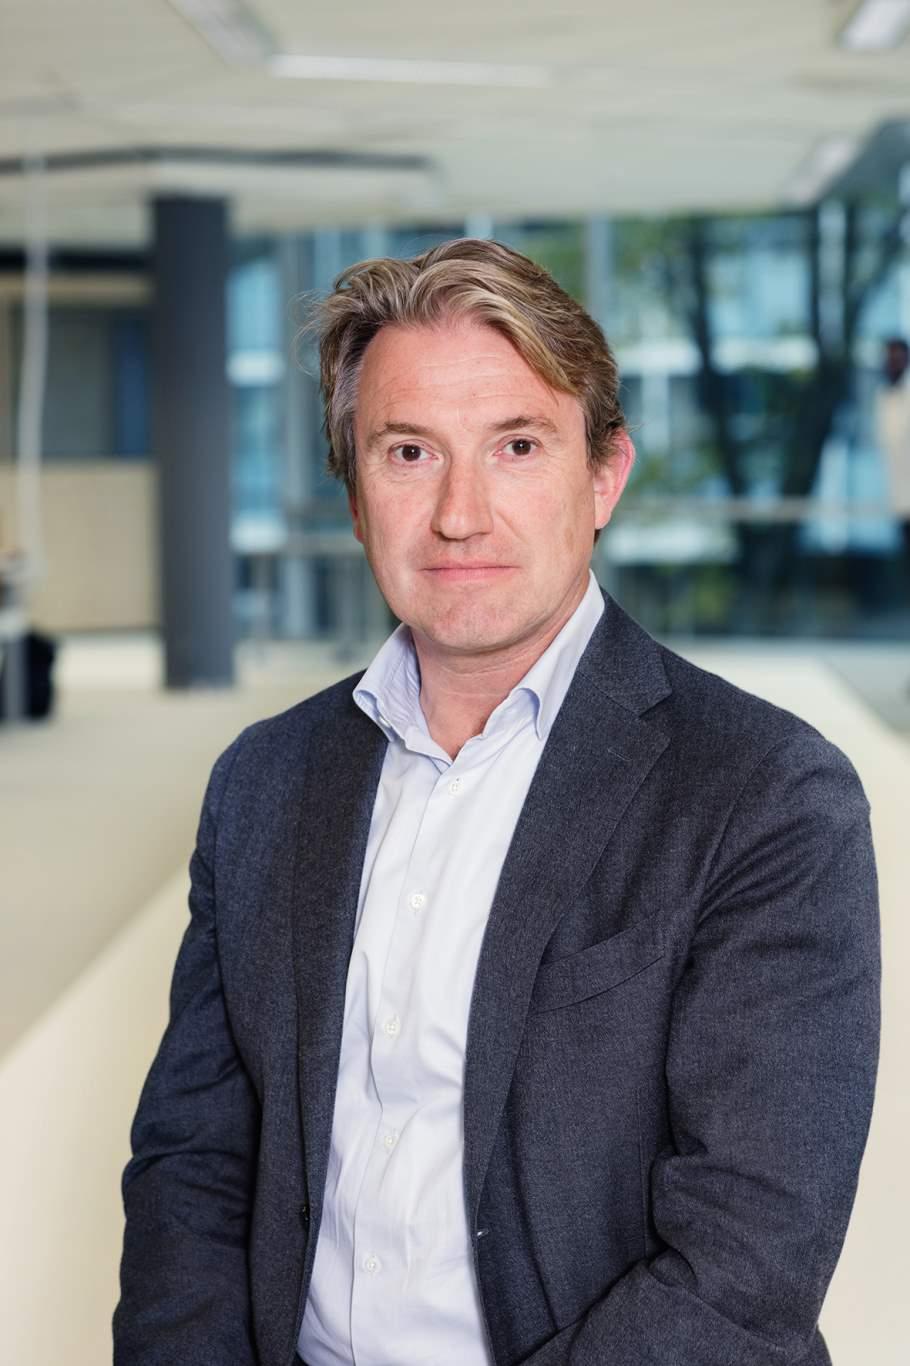 Erik Oostwegel, CEO